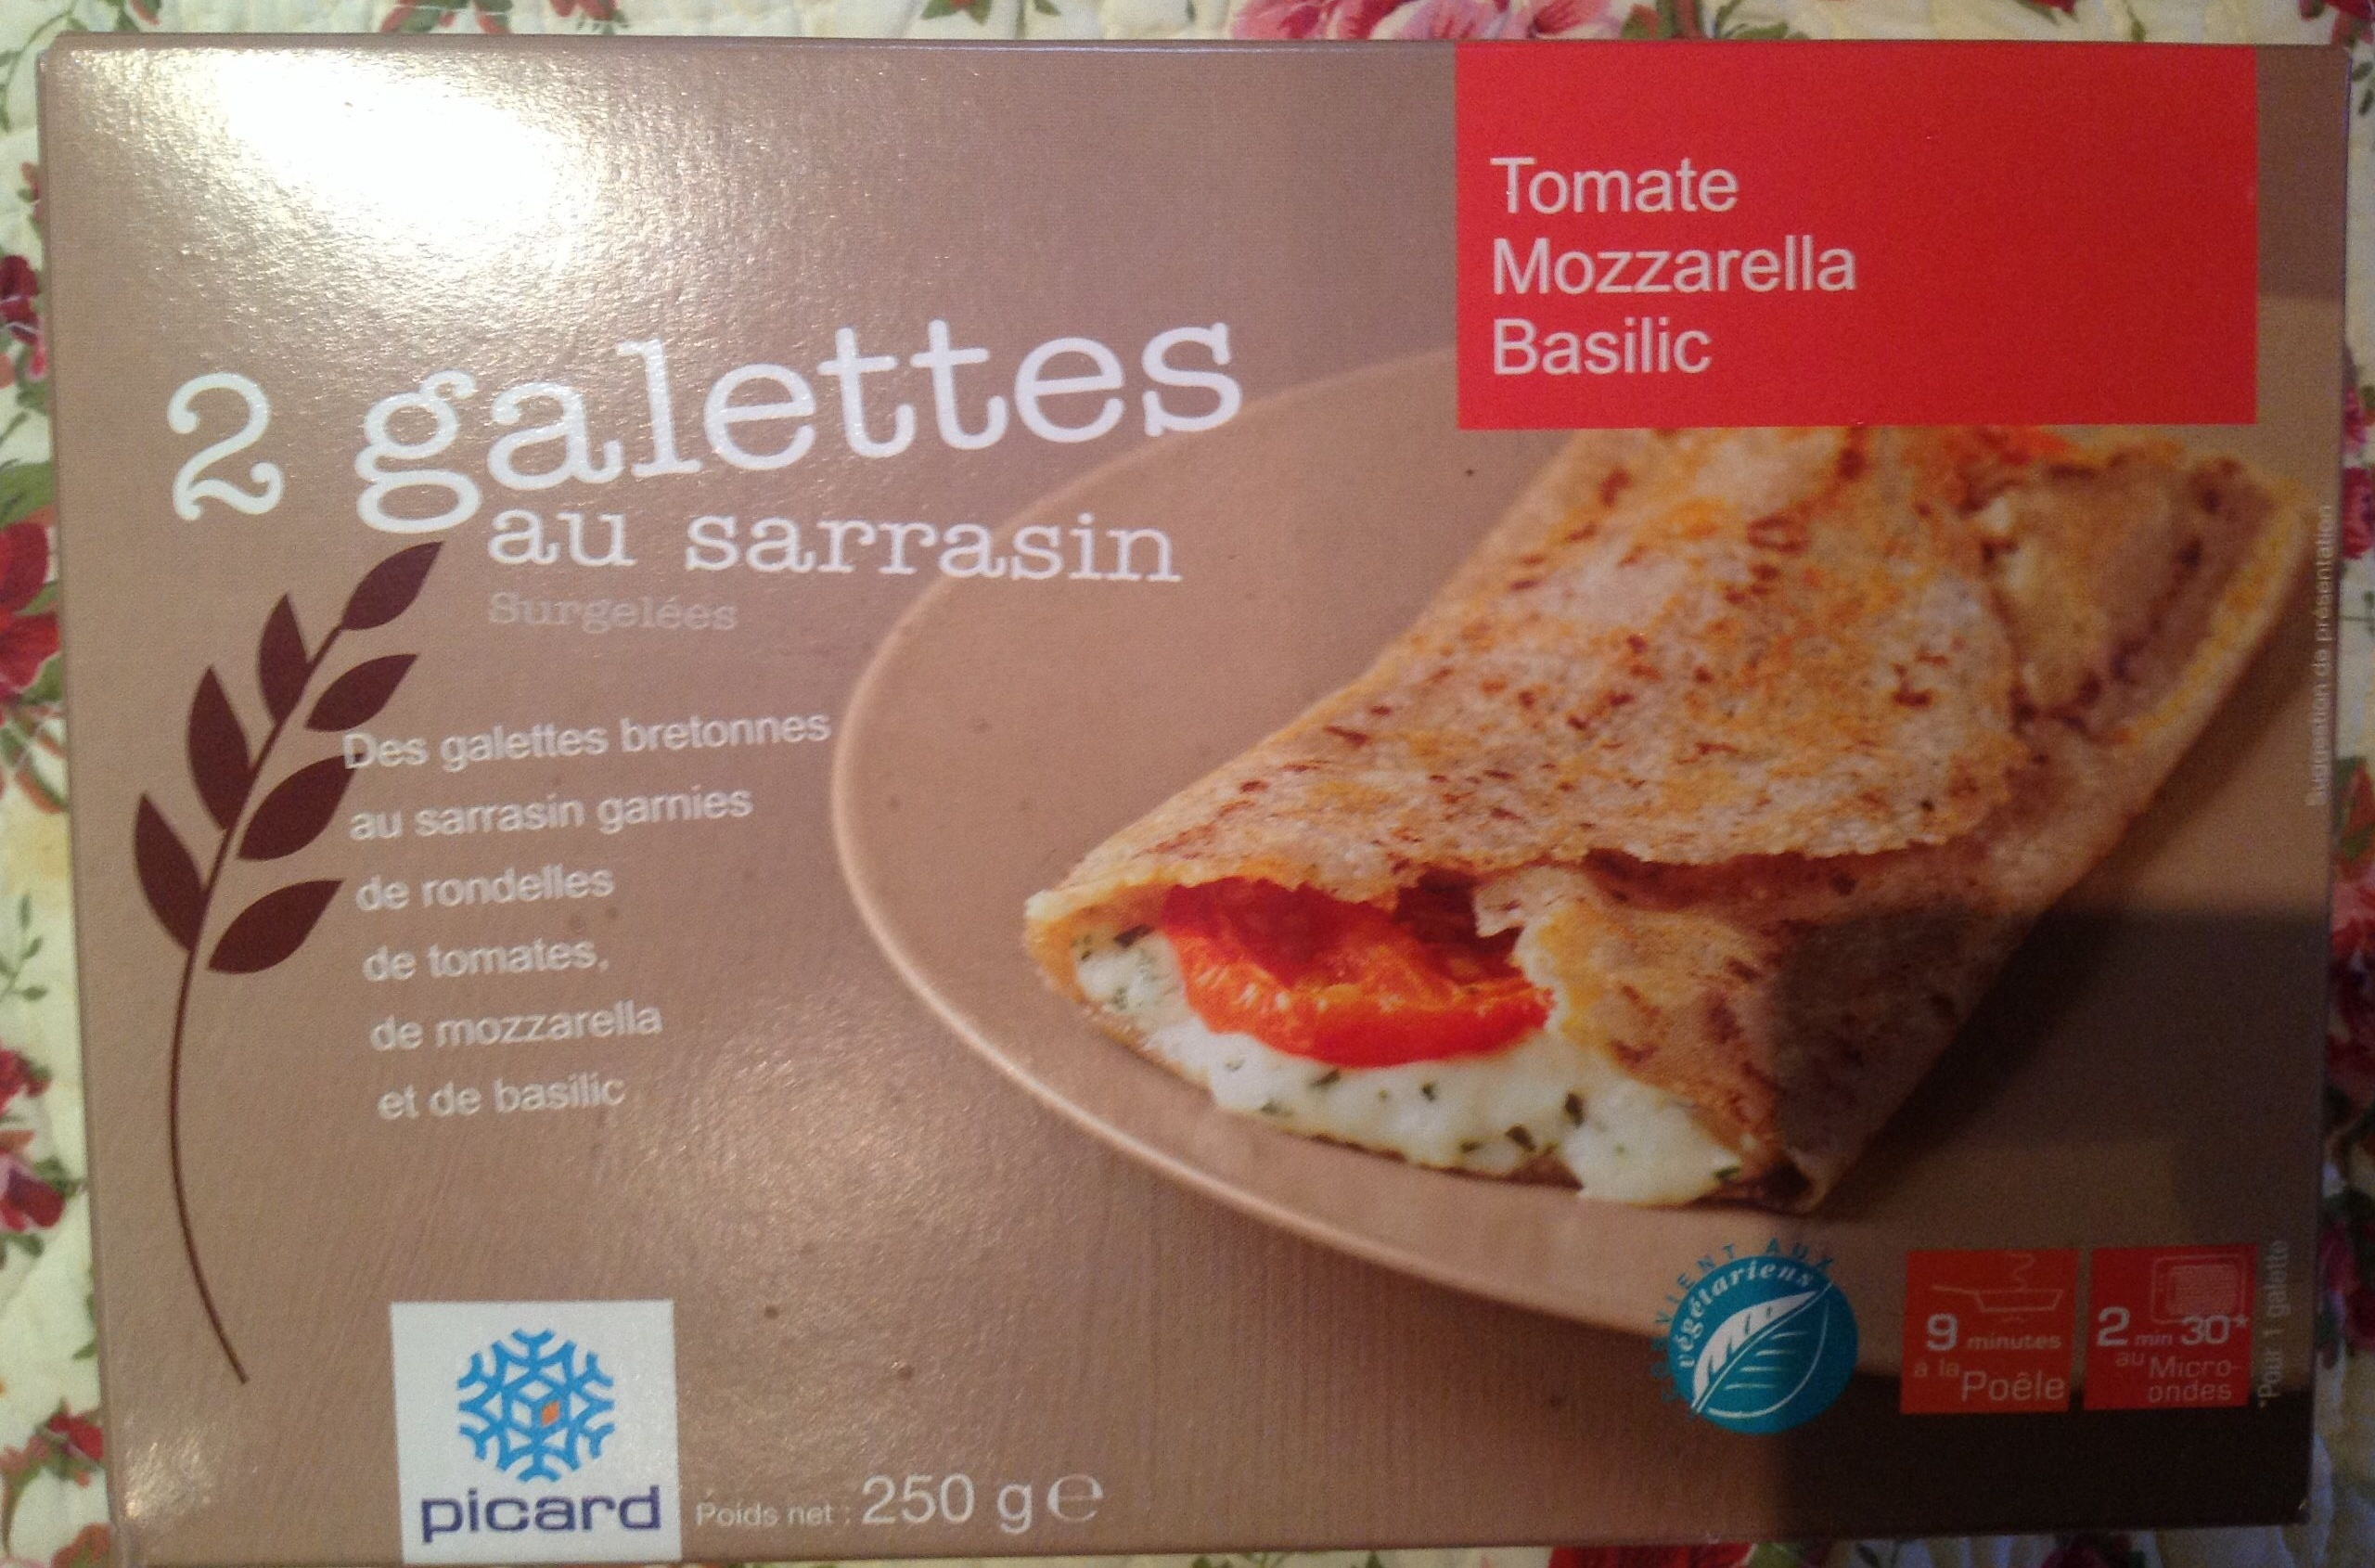 2 galettes au sarrasin tomates mozzarella basilic - Product